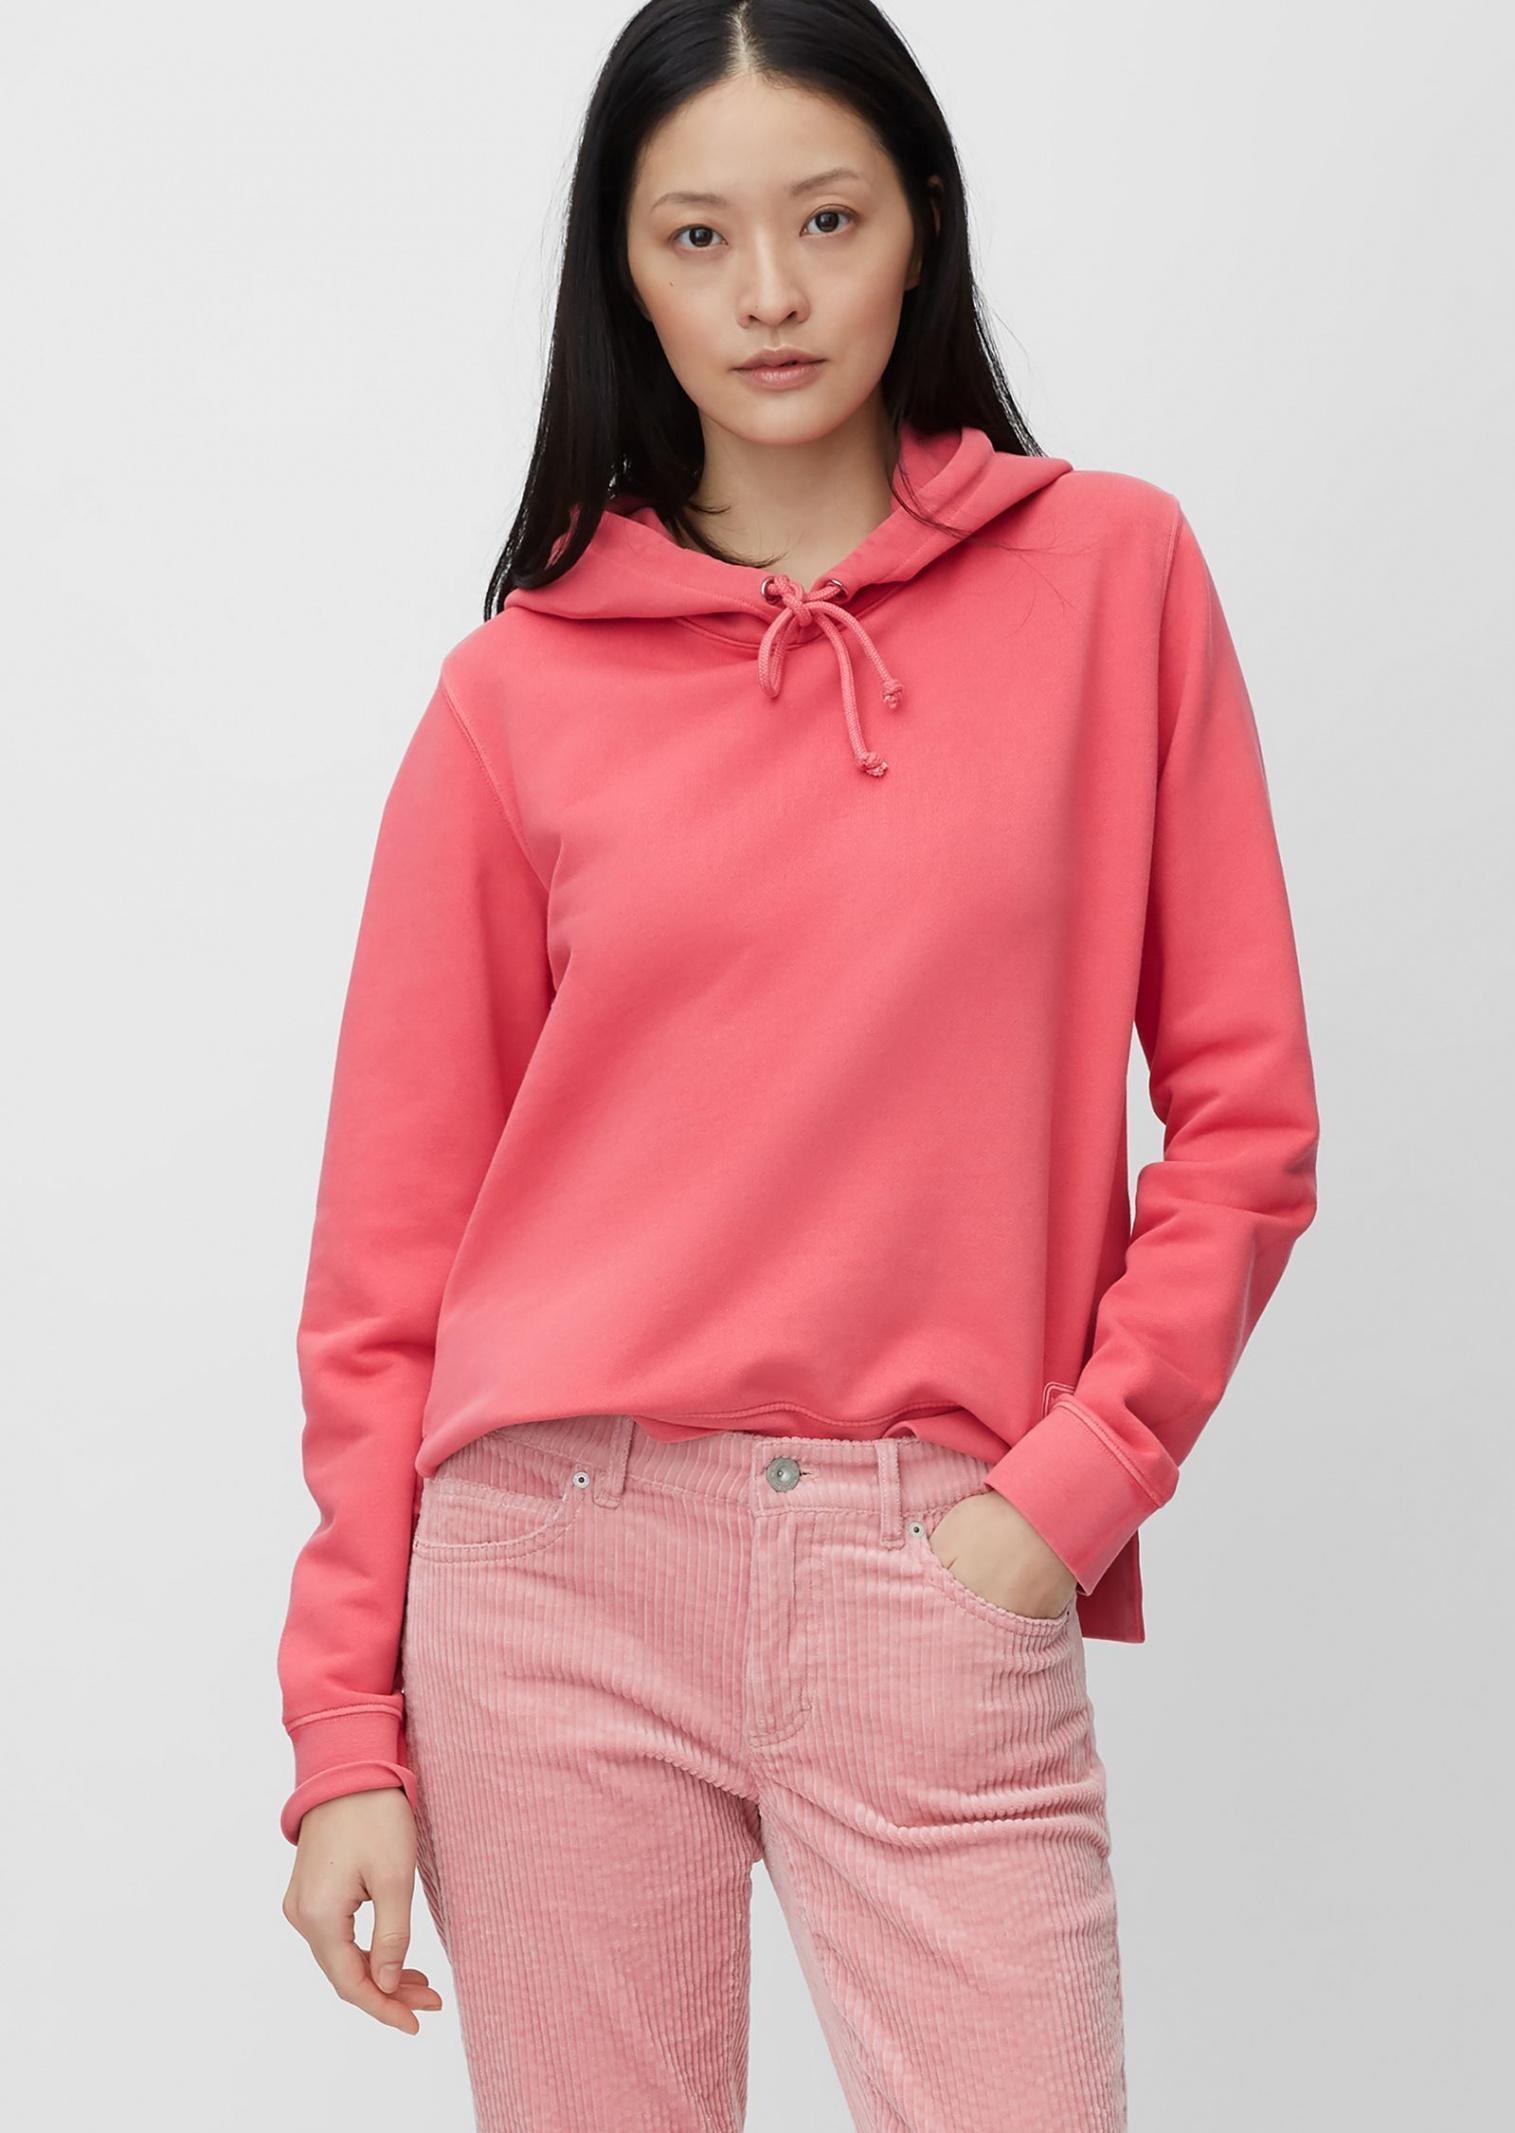 Кофты и свитера женские MARC O'POLO модель PF3950 характеристики, 2017